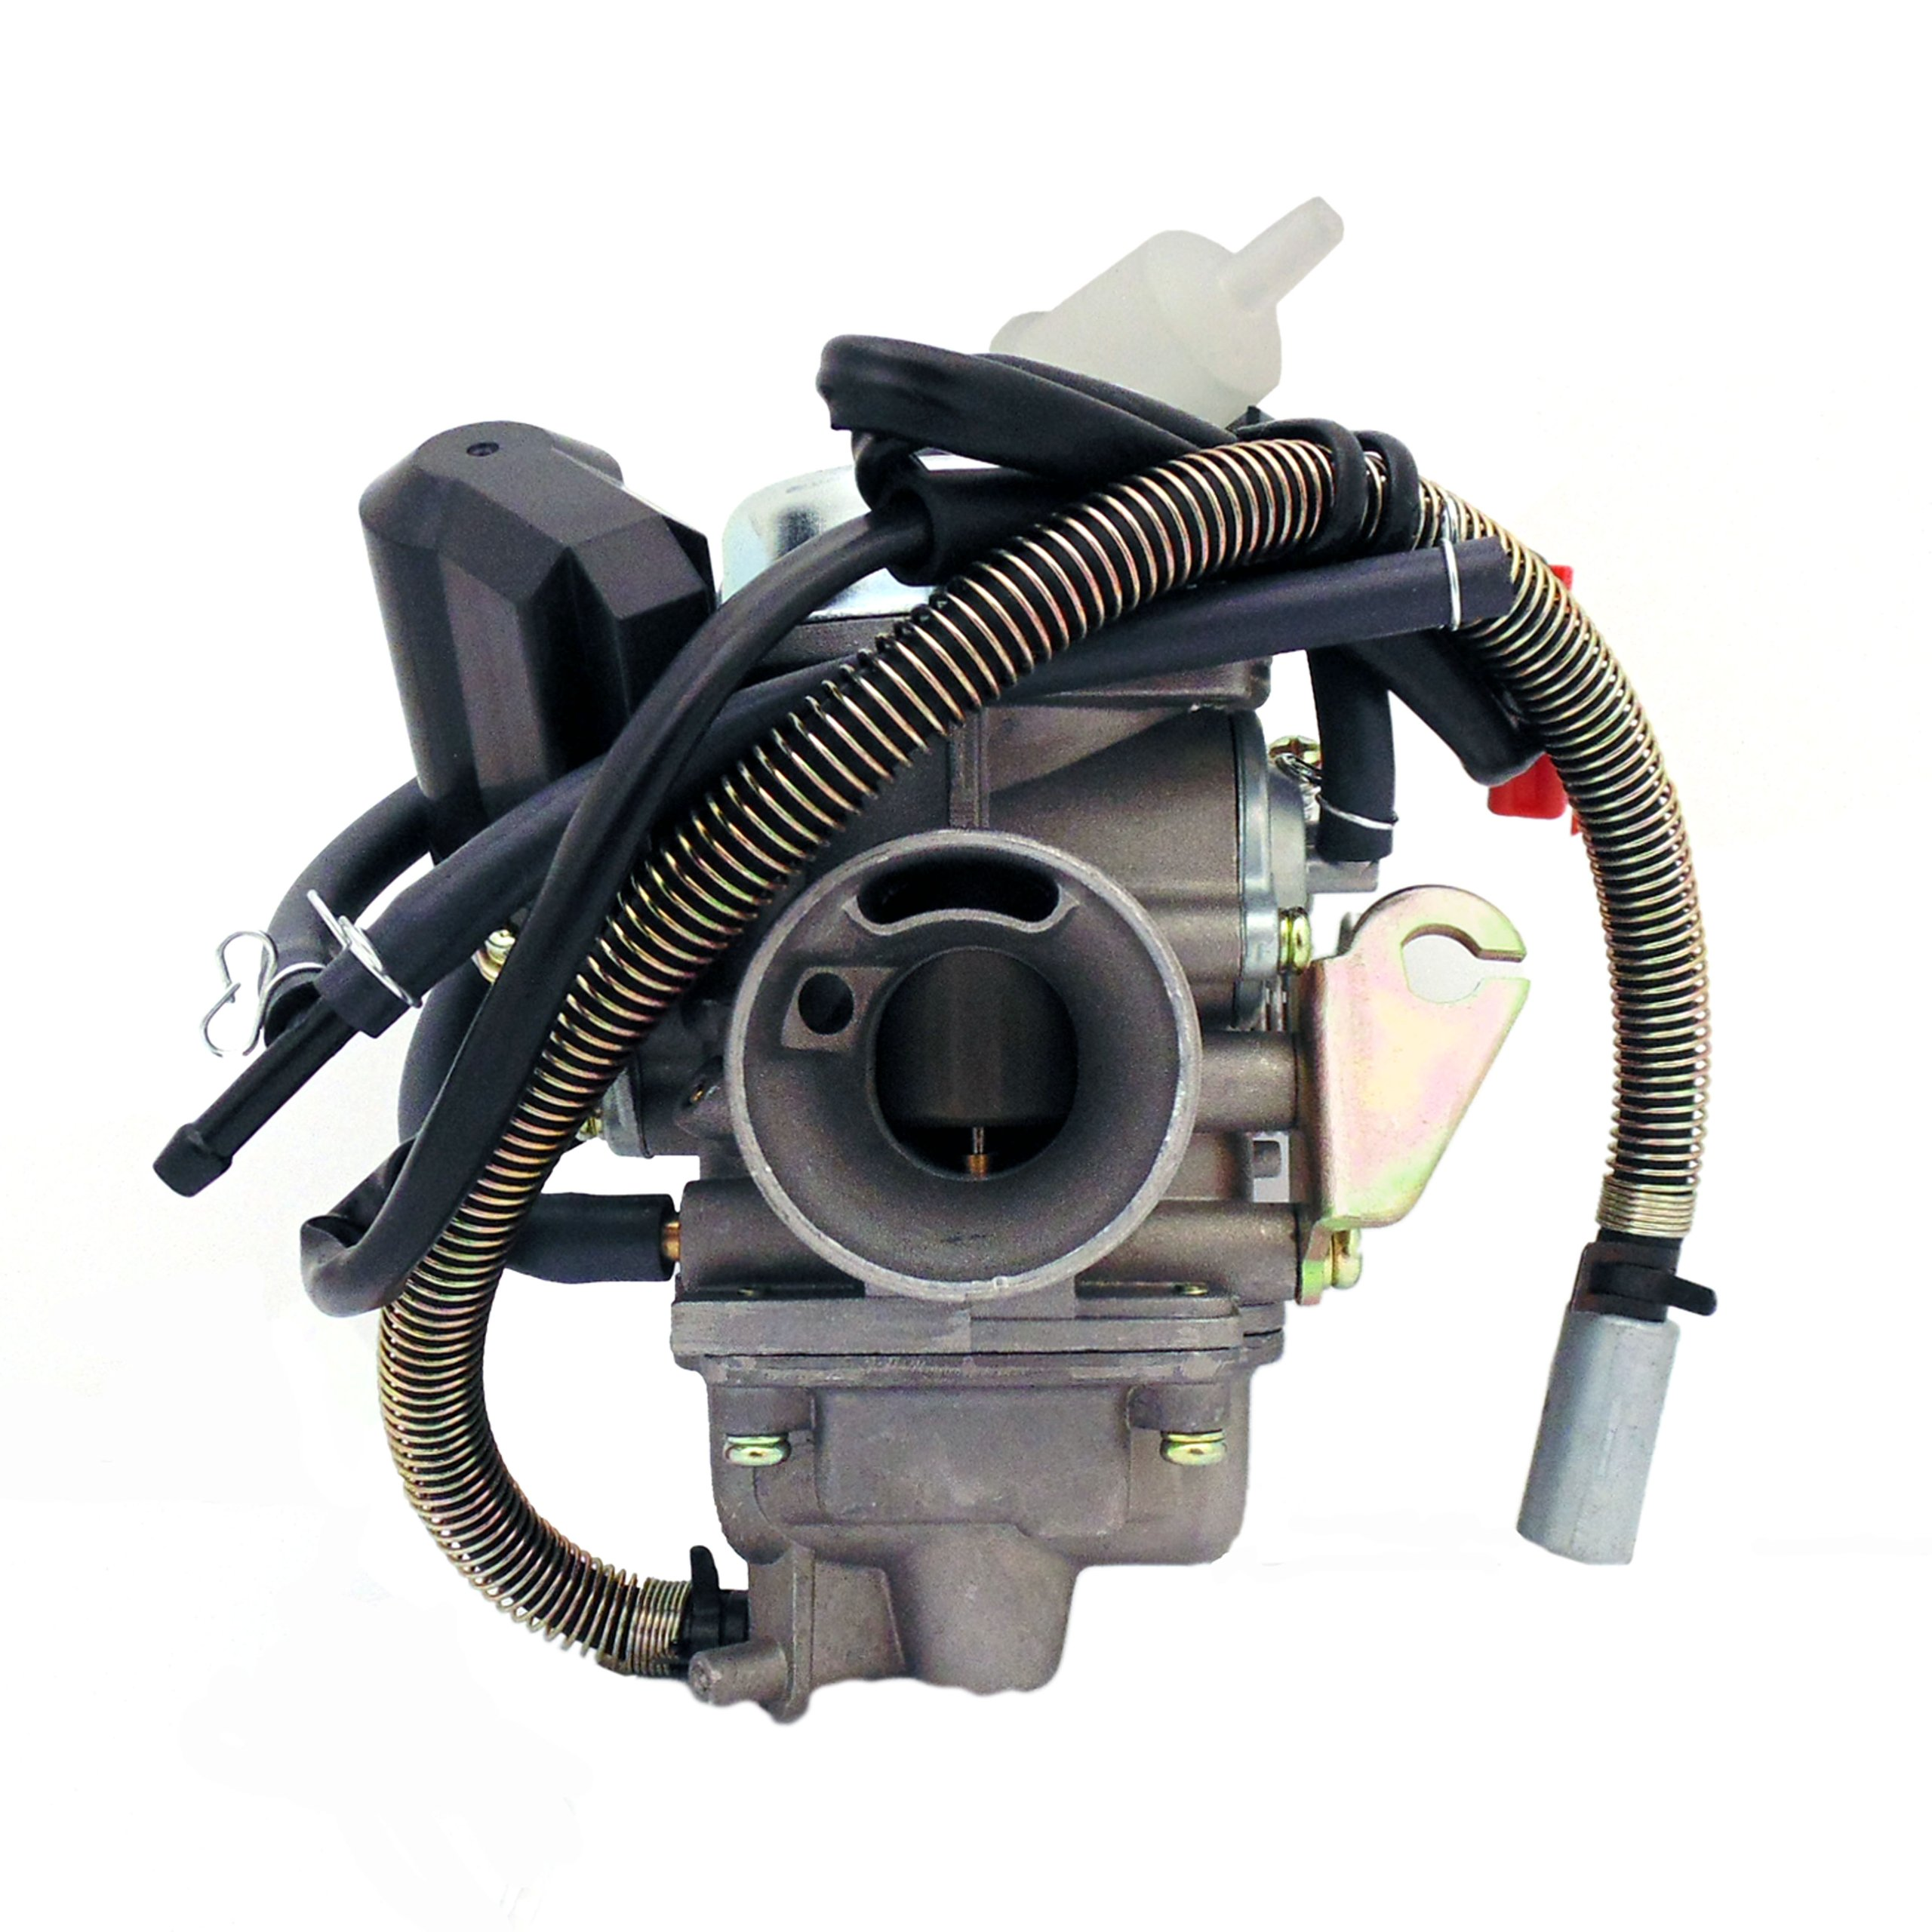 Carburetor Assy 150cc 125cc 4 Stroke Electric Choke Motorcycle Scooter